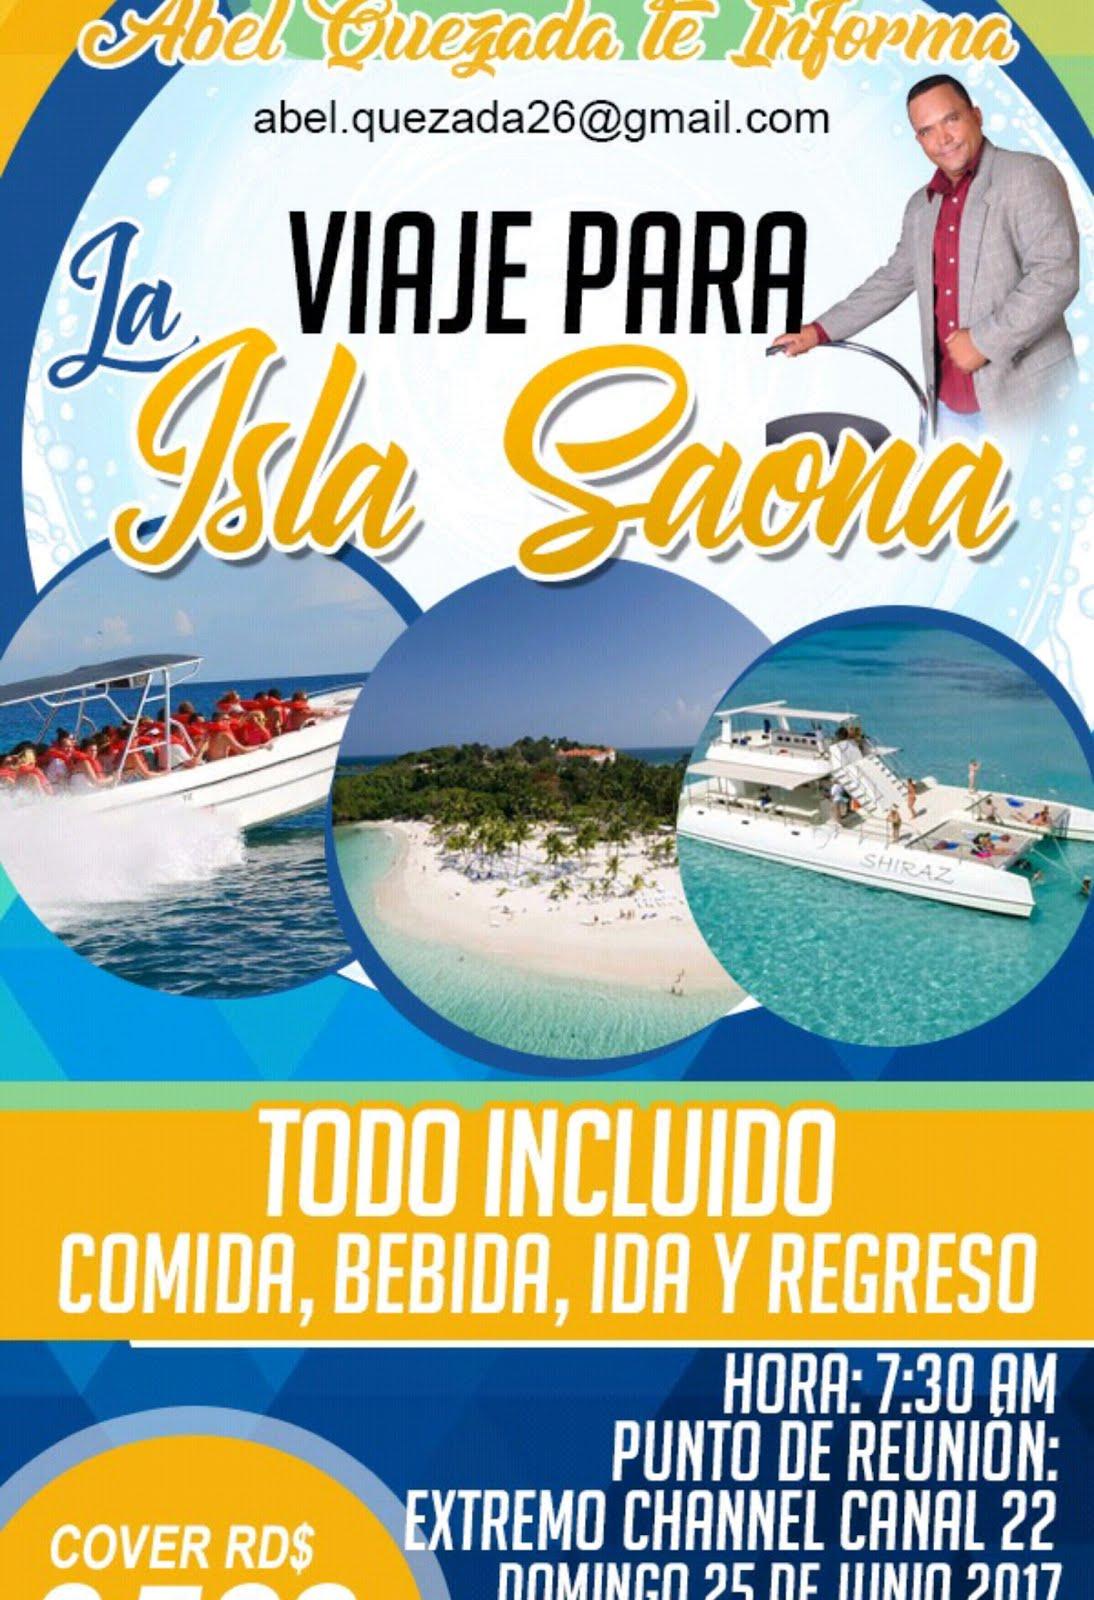 Domingo 25 de Junio vamonos con AbelQuezada.com a la isla Saona